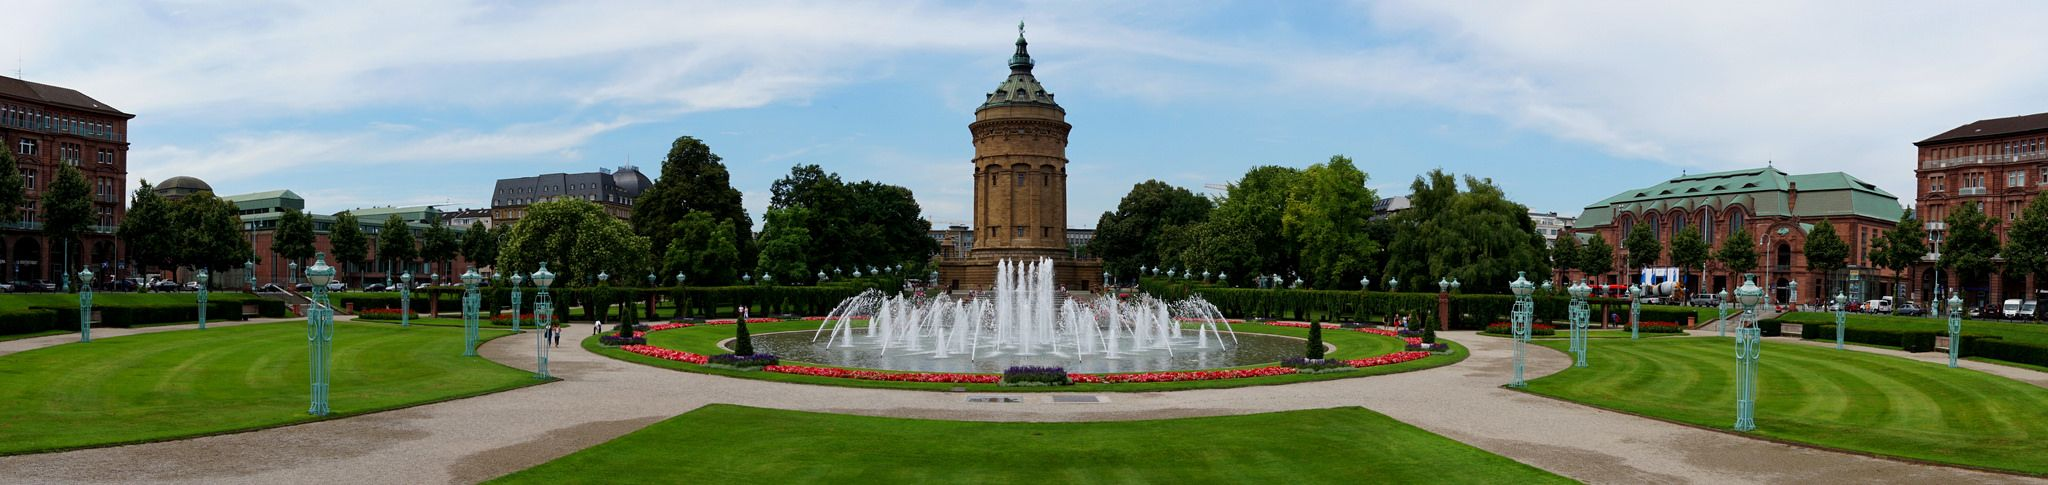 https://flic.kr/p/pYPm8B   Mannheim panorama   Mannheim architecture panorama, fountains surrounding the Wasserturm (water tower) in the center of Mannheim